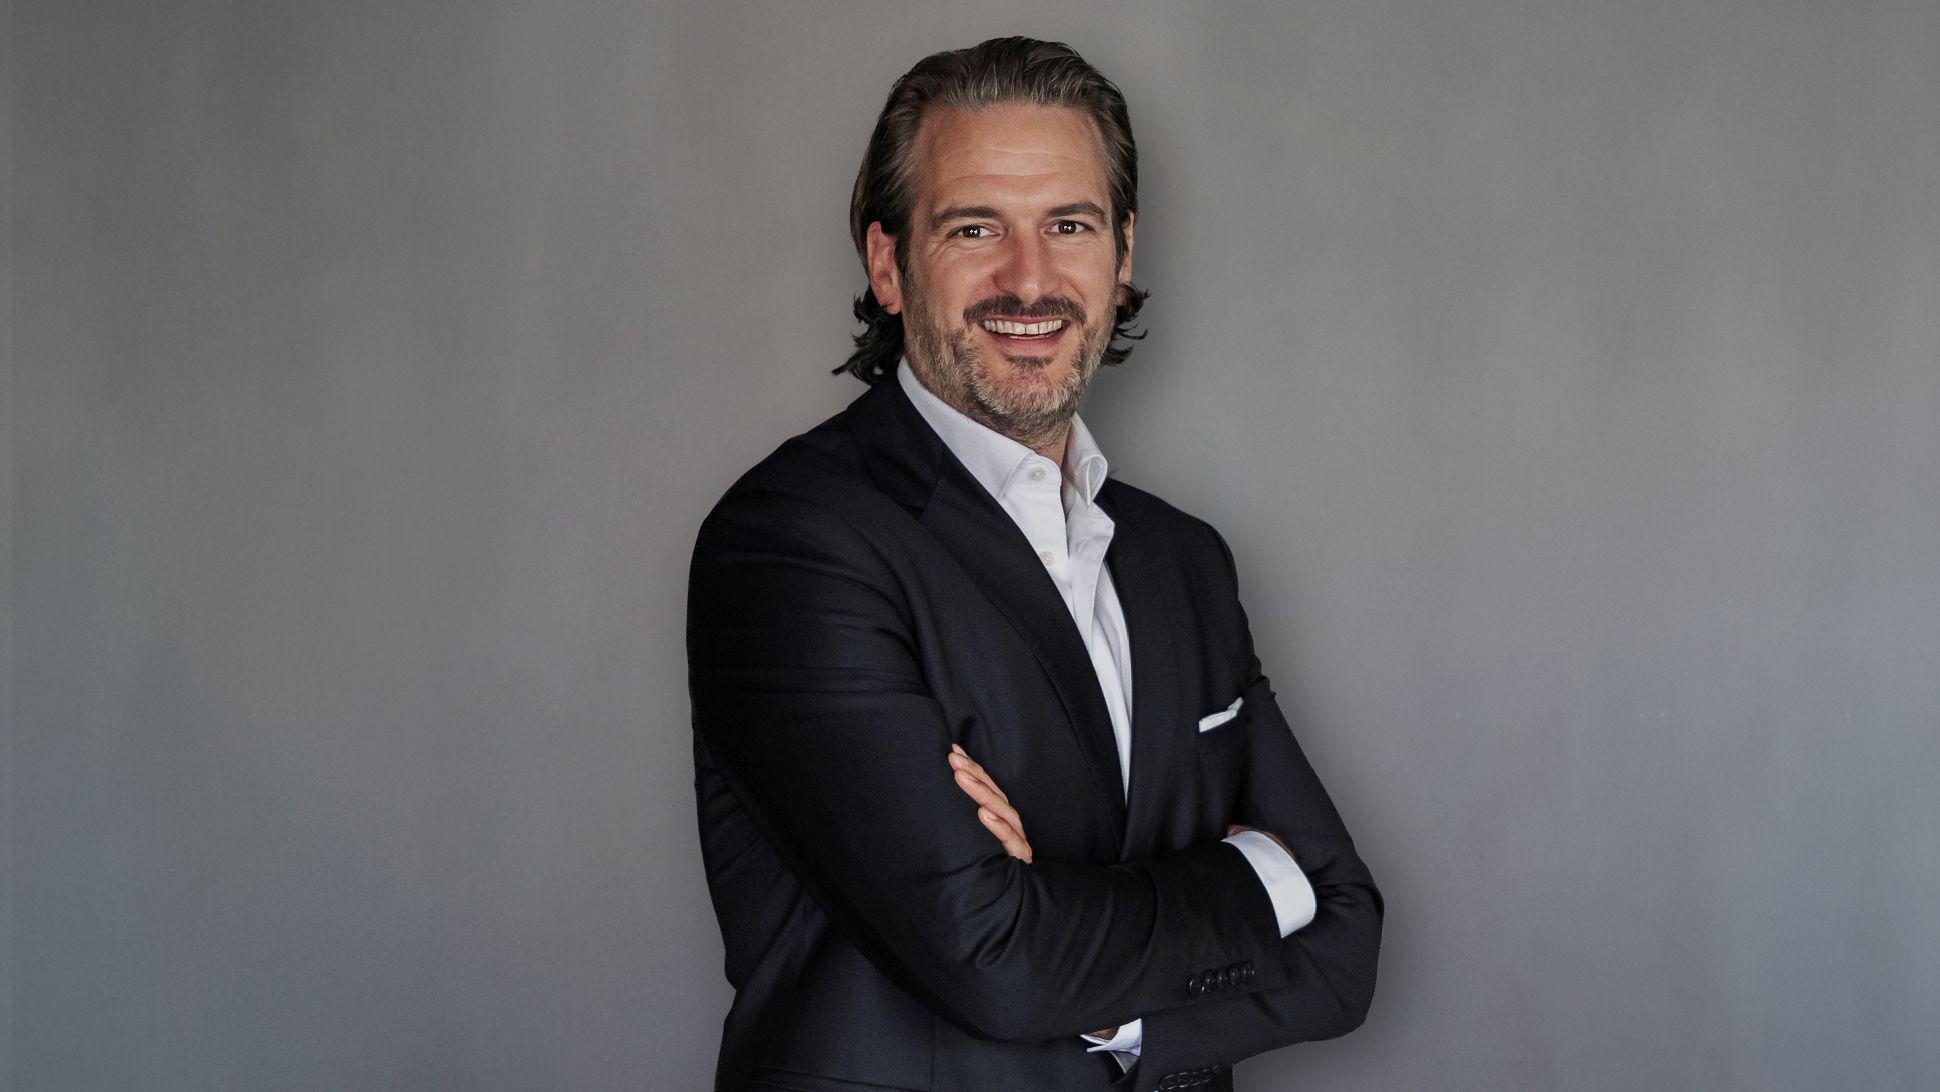 Florian Kohfeldt Gehalt